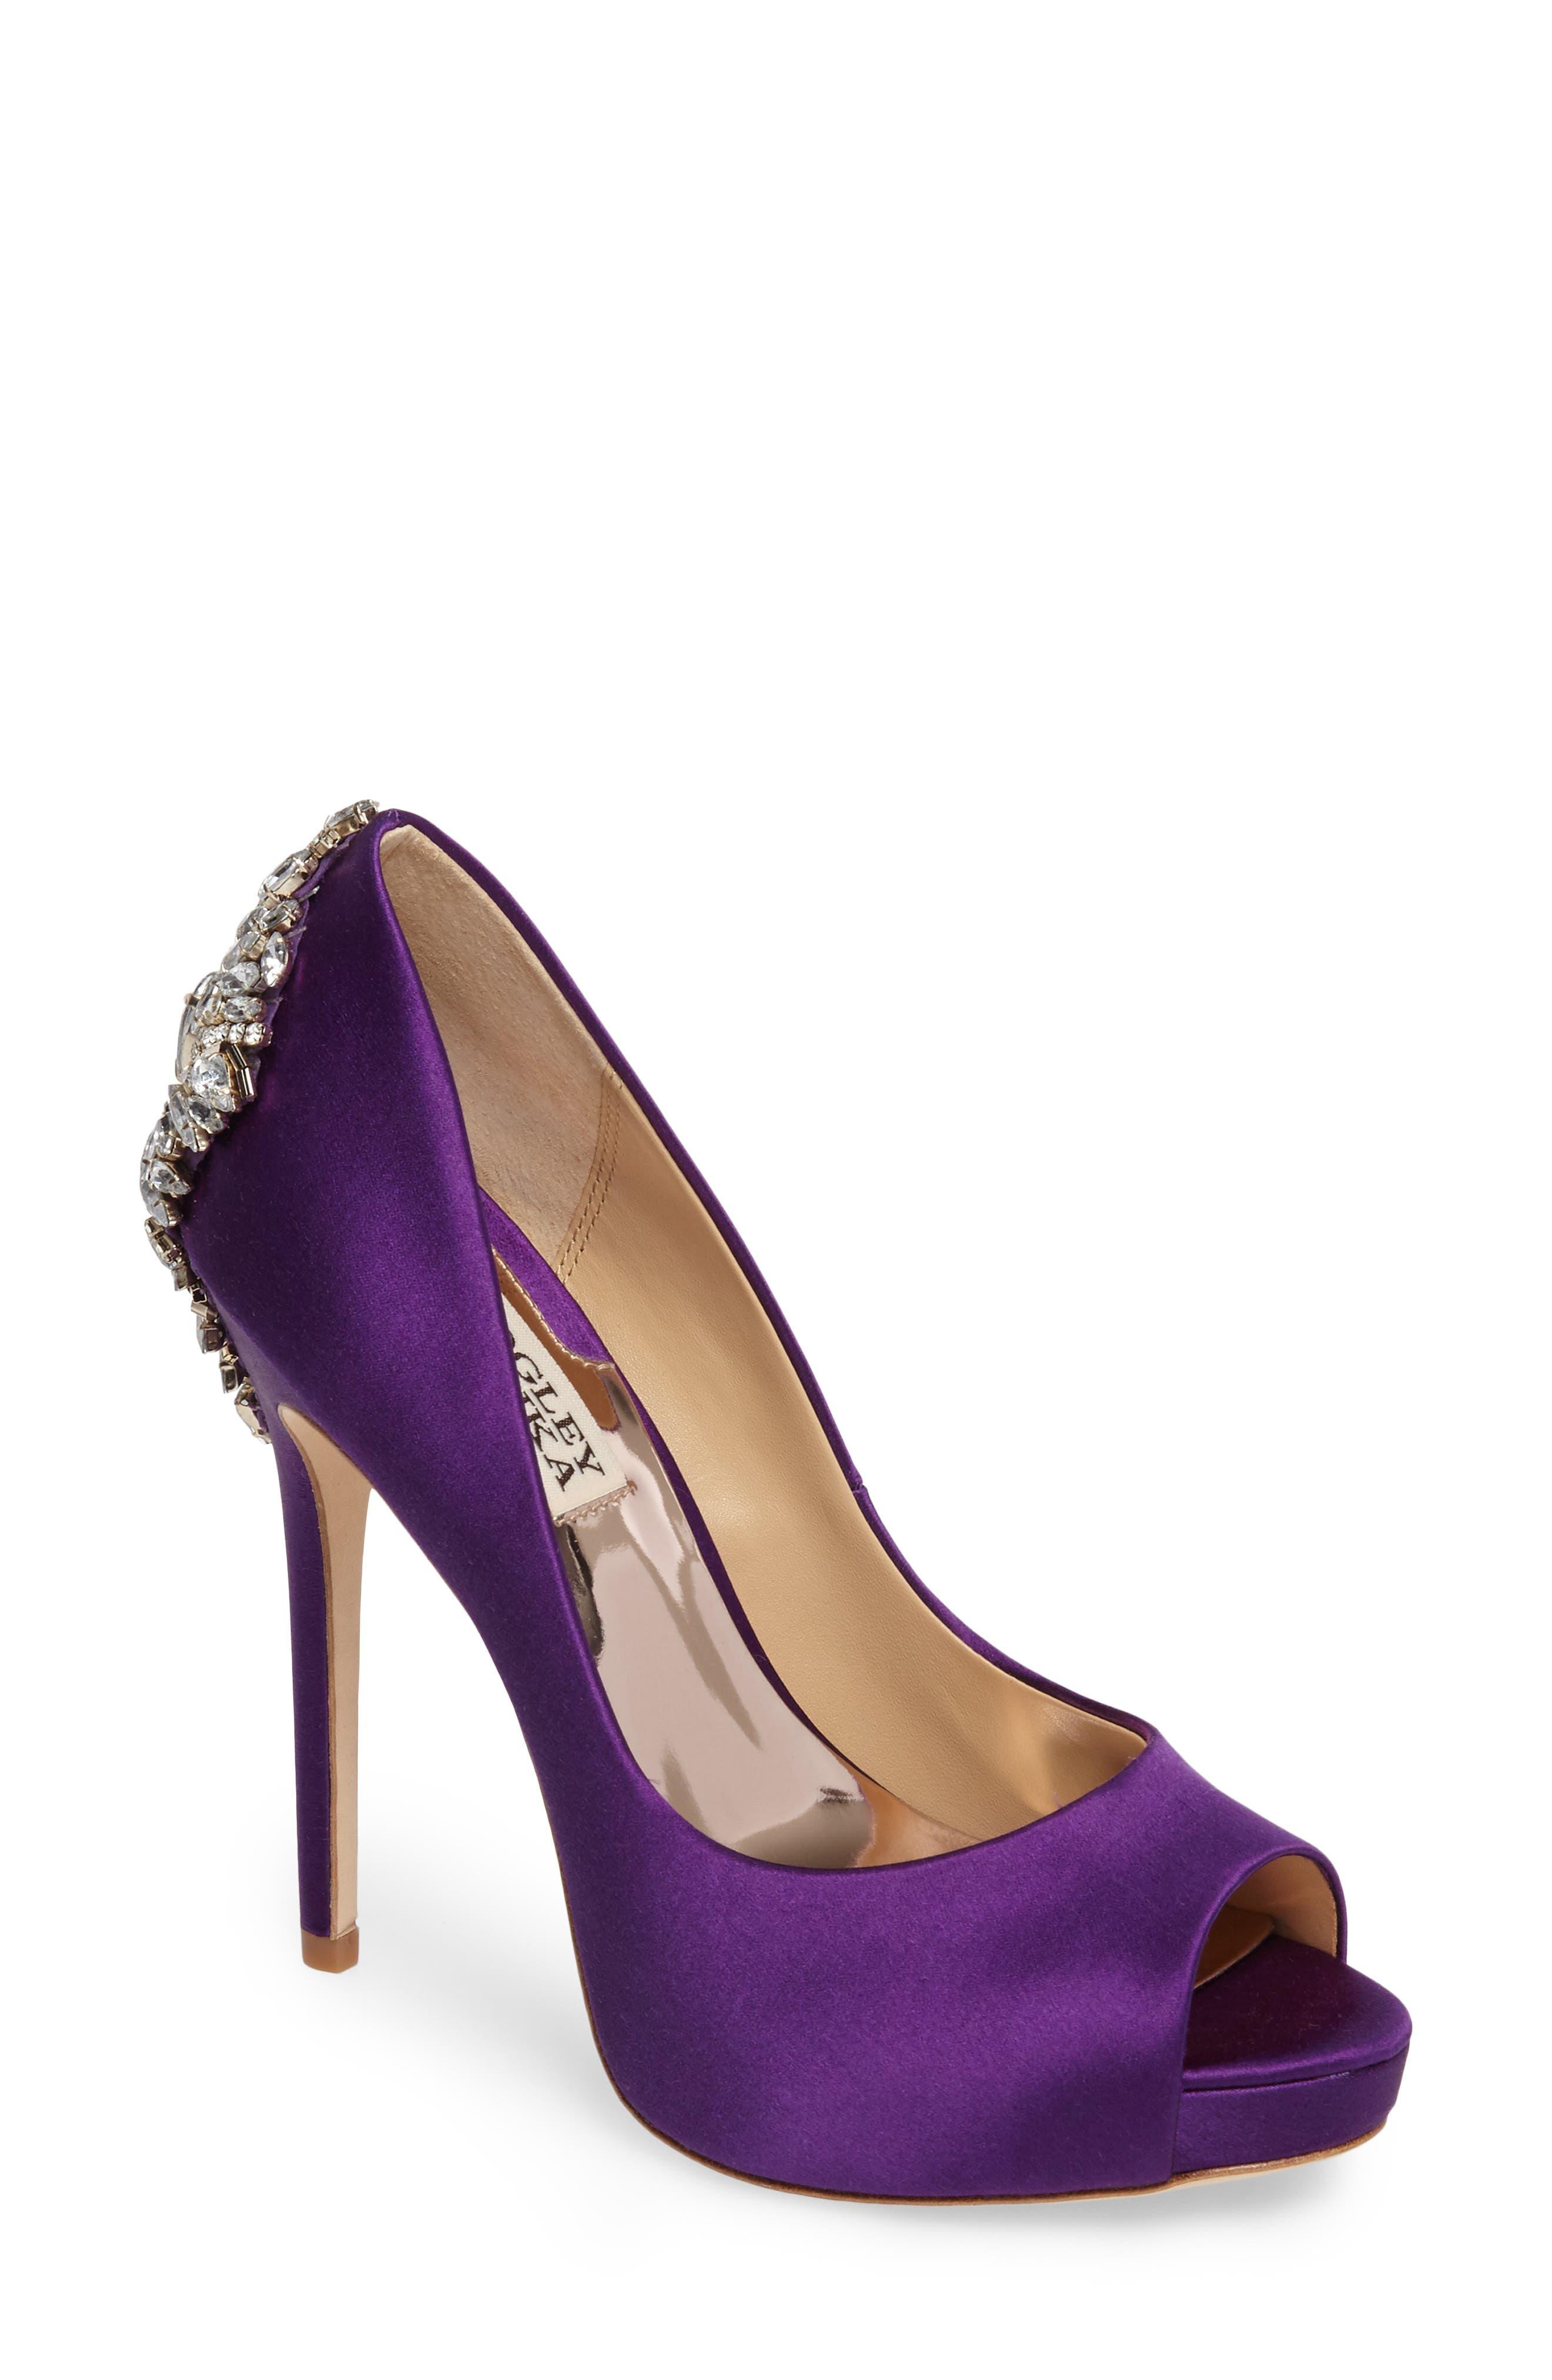 'Kiara' Crystal Back Open Toe Pump,                             Main thumbnail 1, color,                             Purple Satin